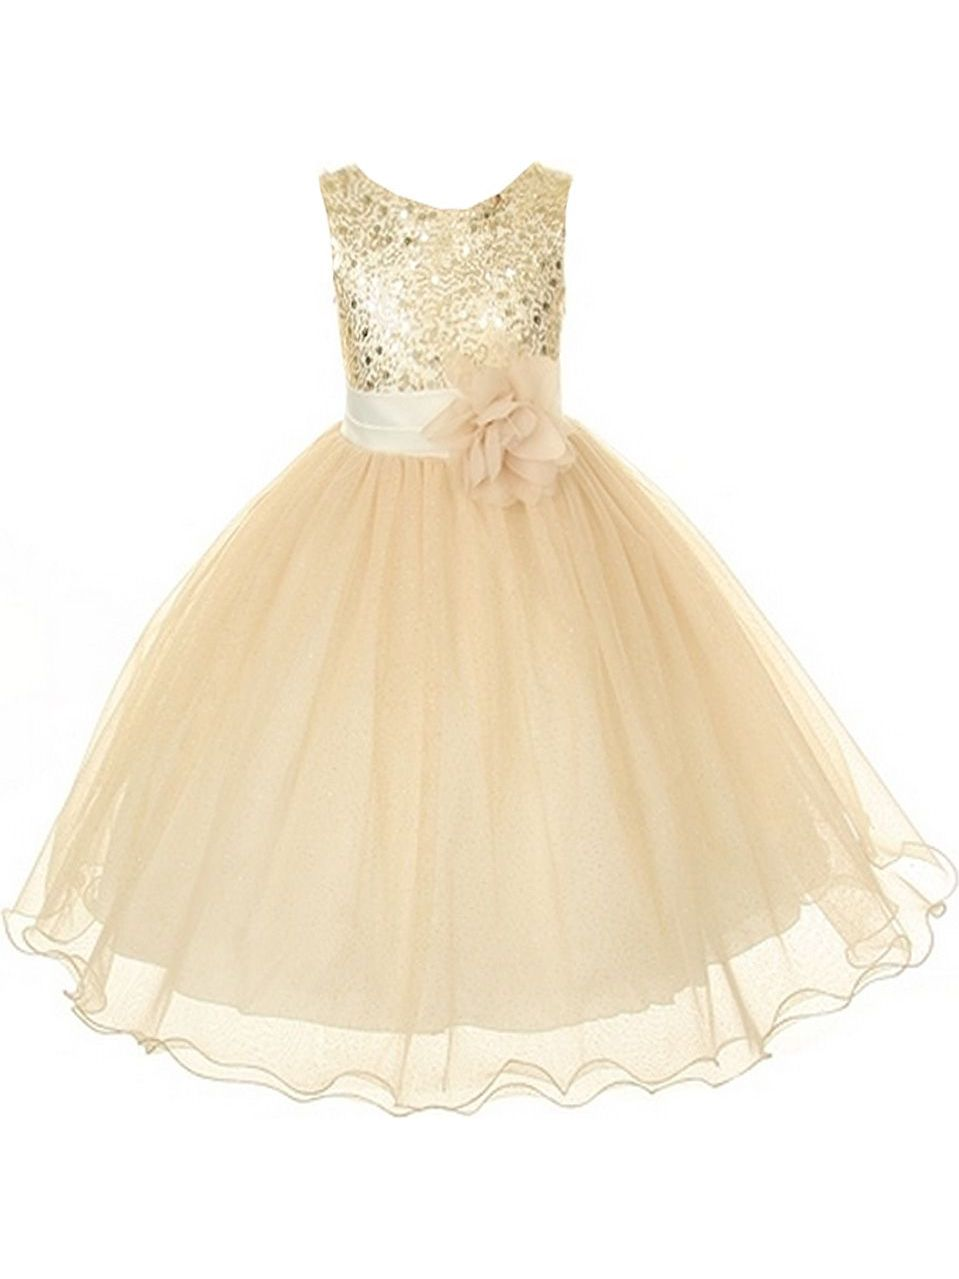 Kids Dream Big Girls Gold Sequin Bodice Floral Overlaid Flower Girl Dress 8